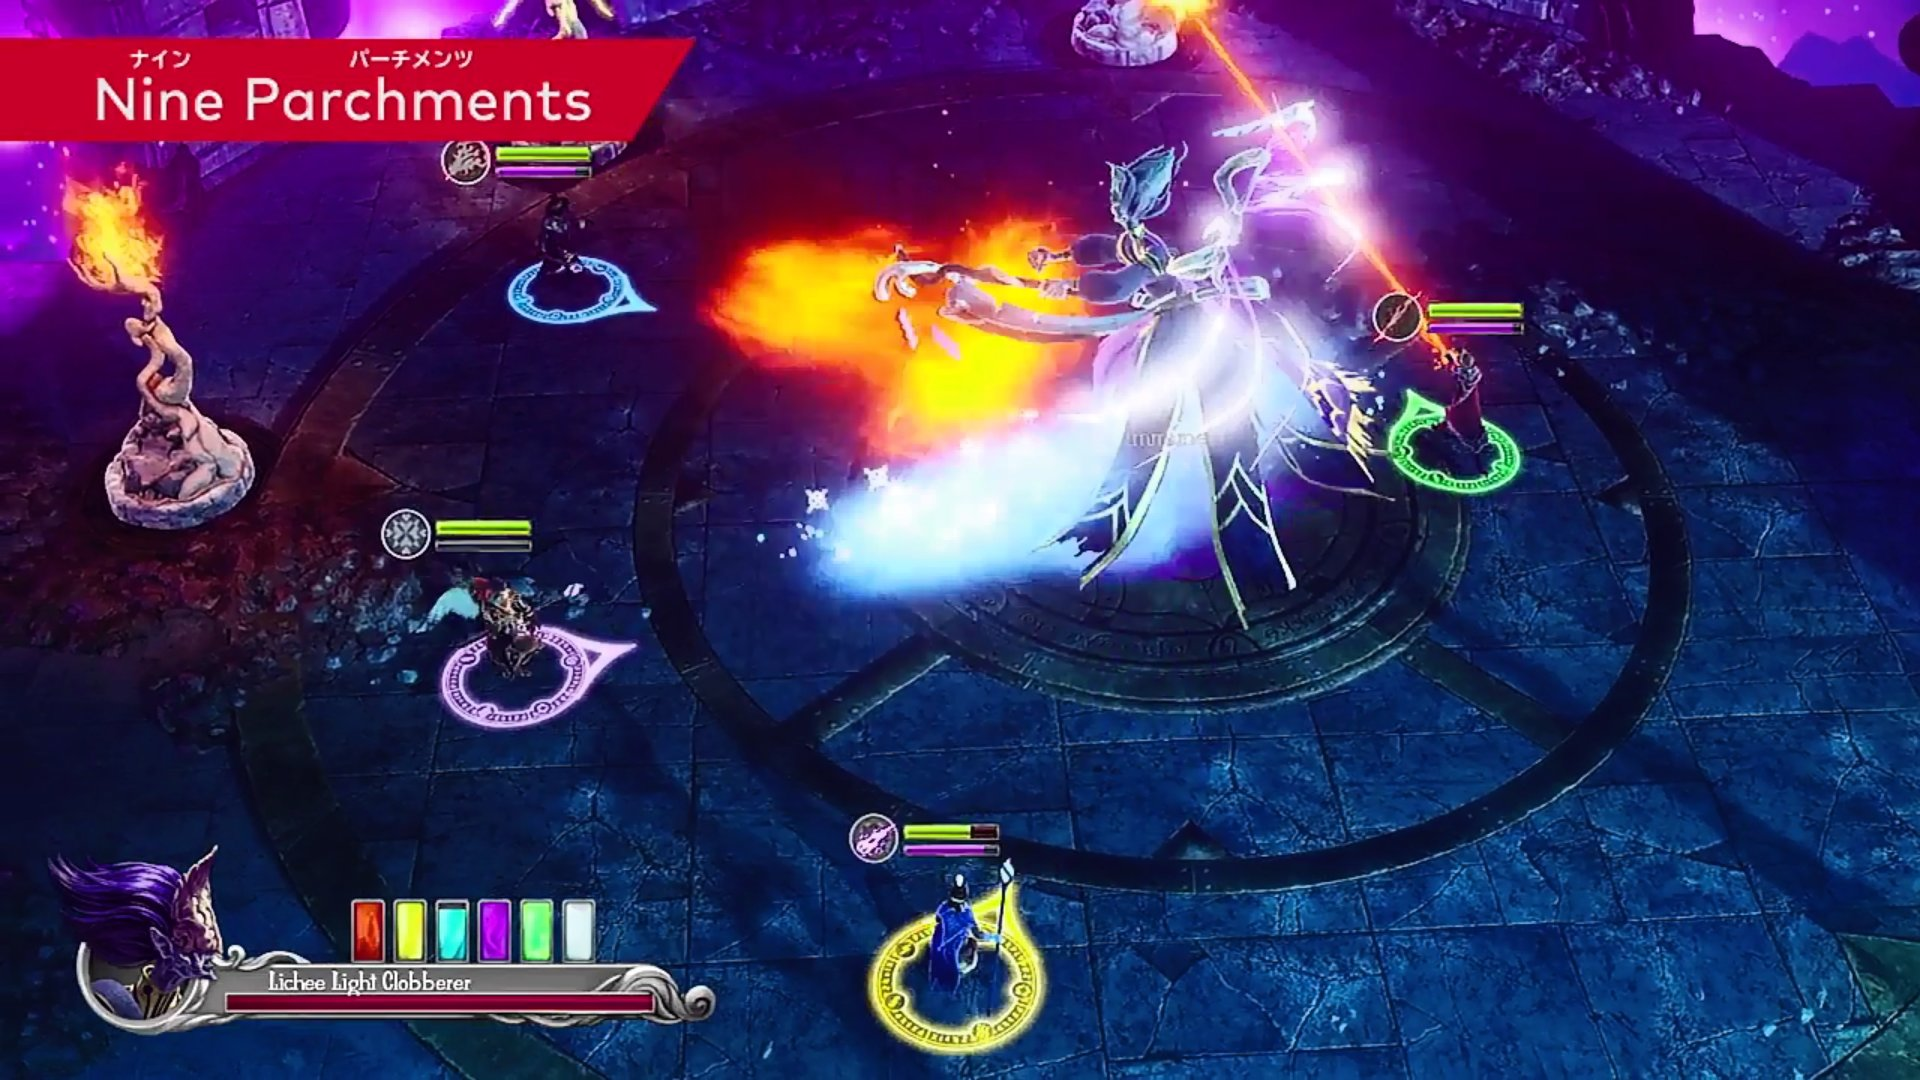 Nintendo Switchインディーズゲーム『Nine Parchments』